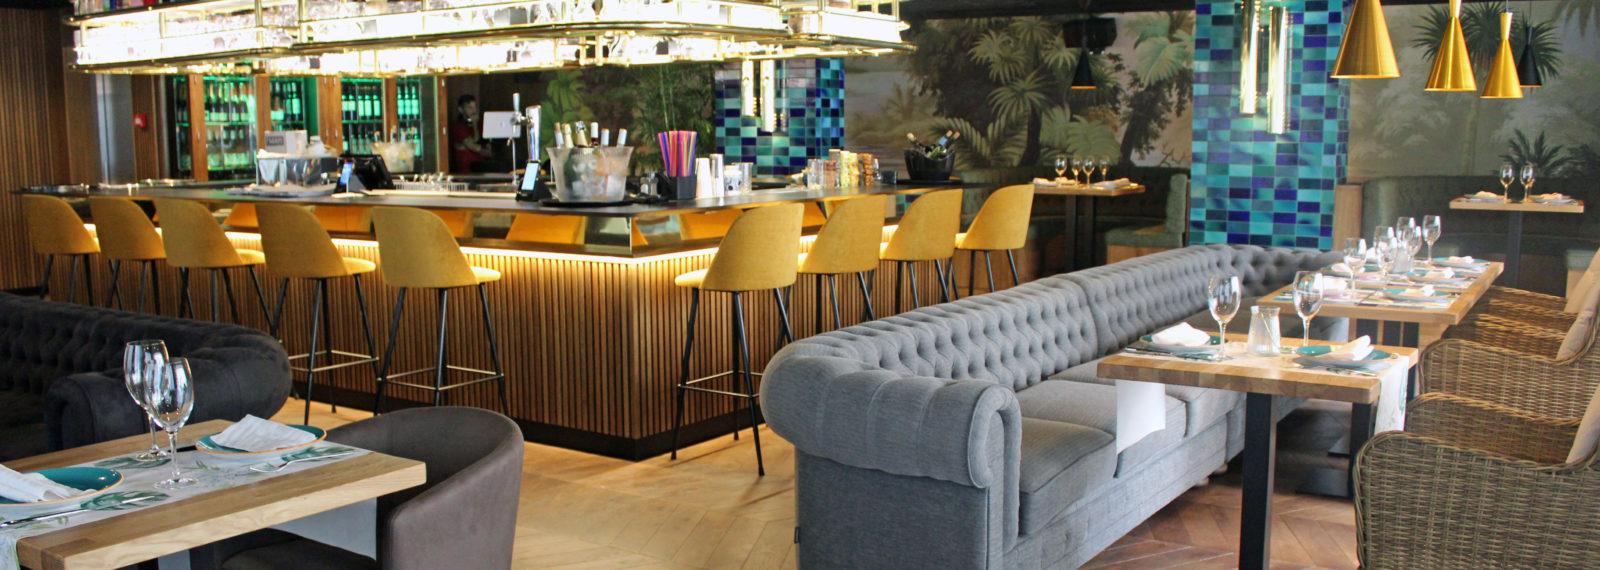 Yub una vuelta al mundo para los sentidos seg n m laga for Hotel malaga premium